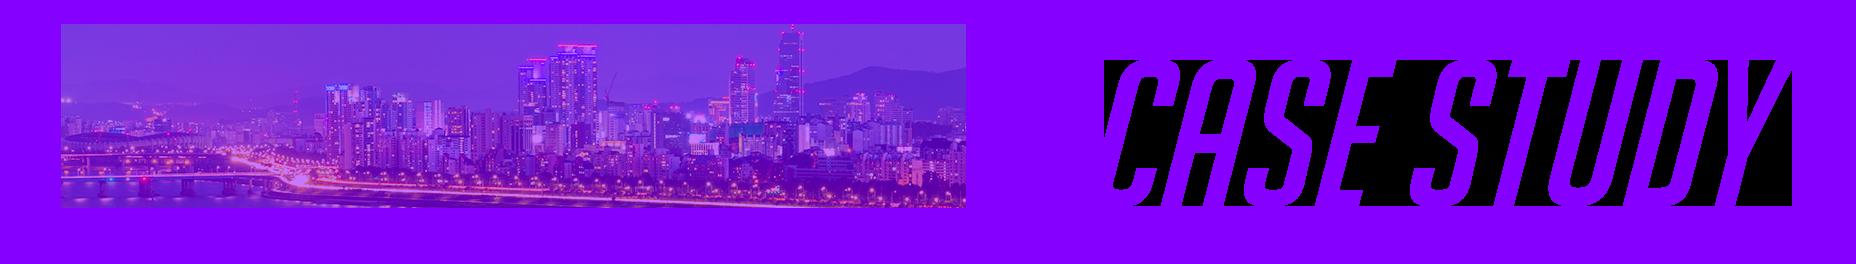 SC-Kablee-Case-Study-Logo2